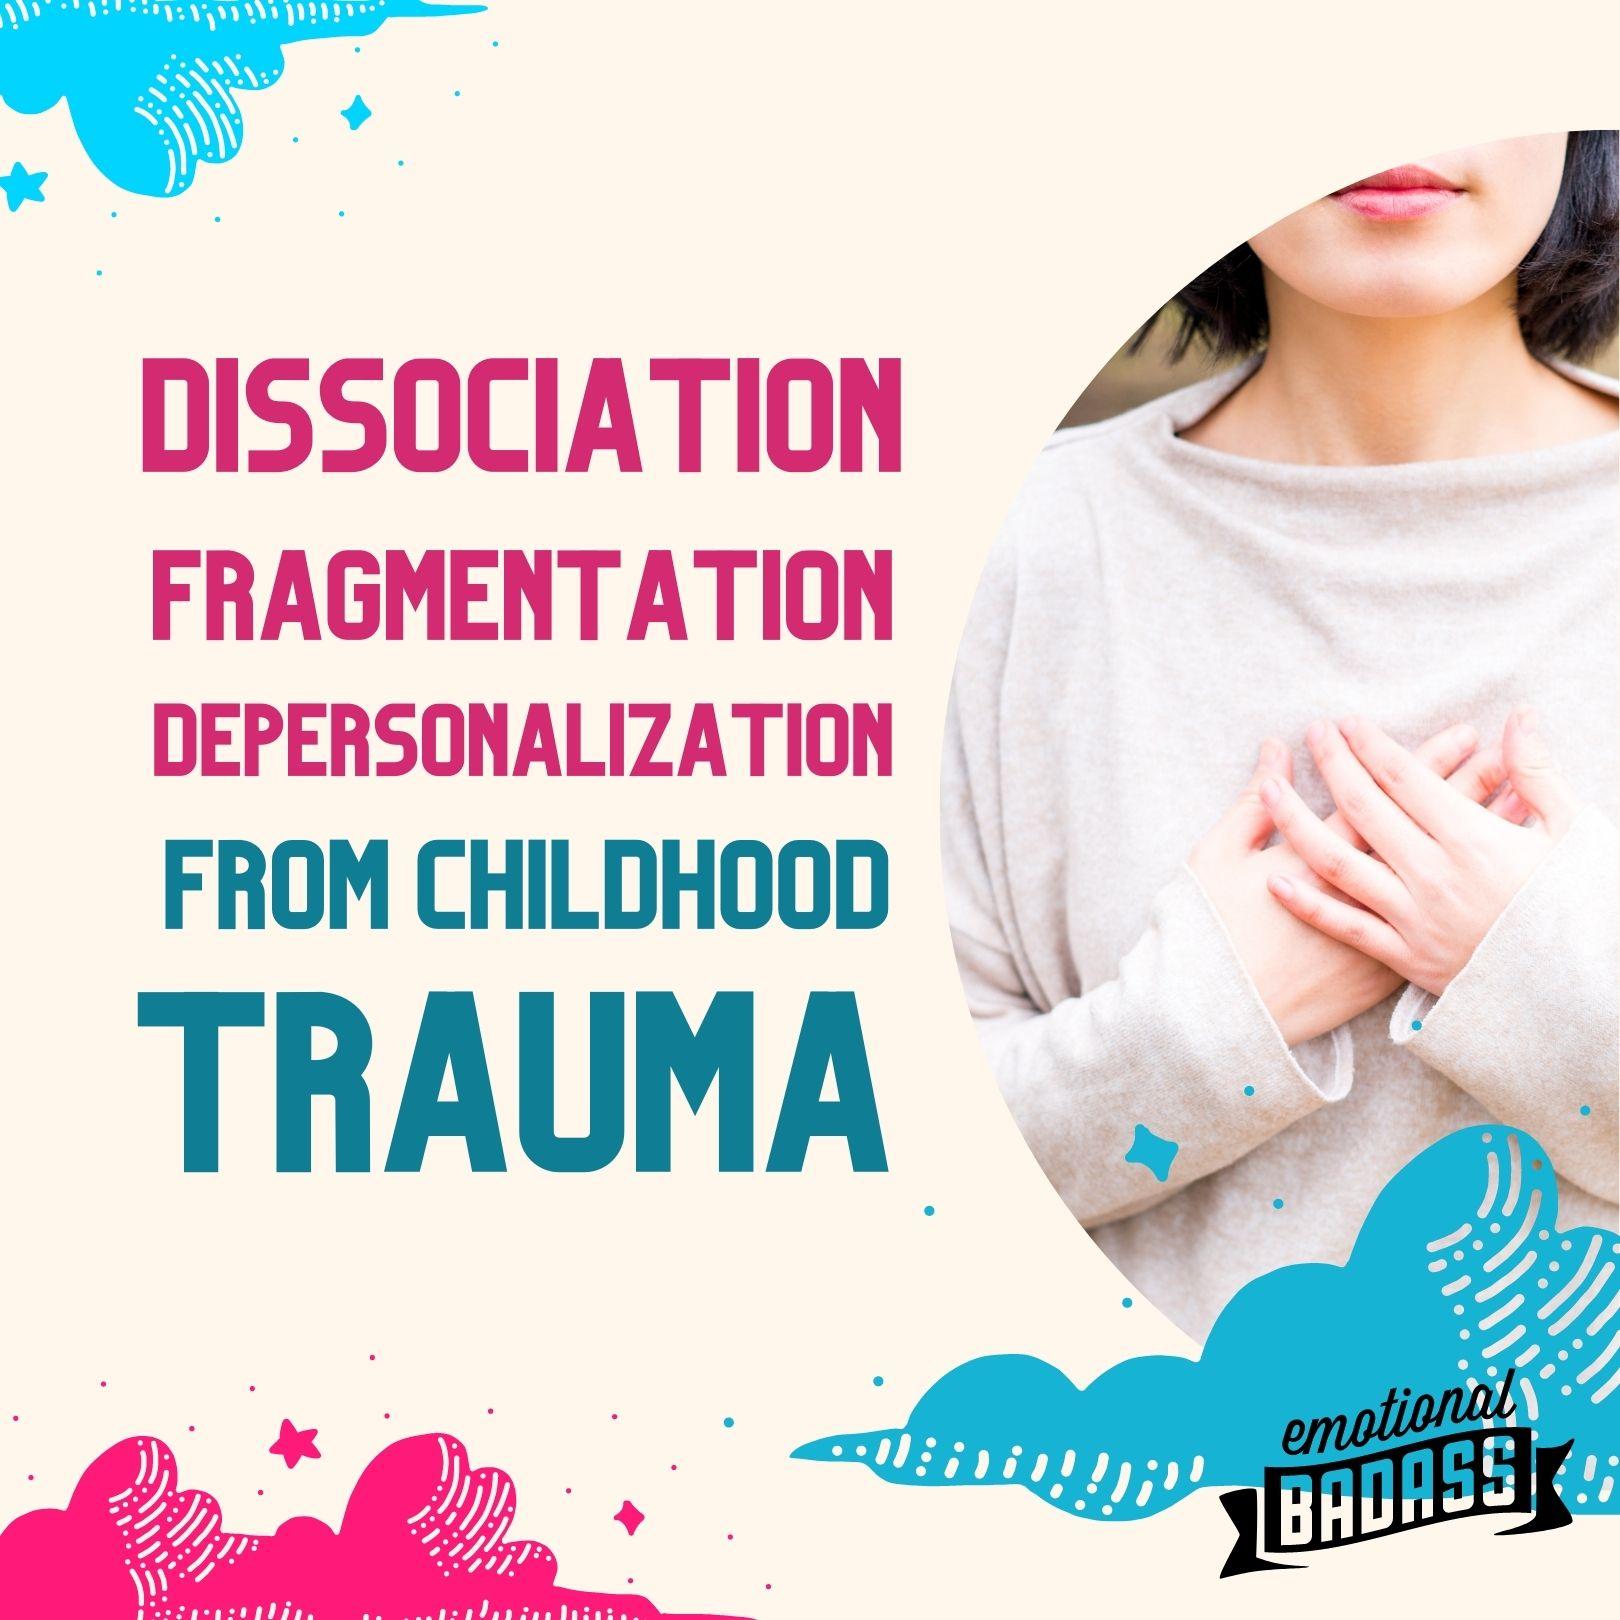 Dissociation, Fragmentation and Depersonalization from Childhood Trauma